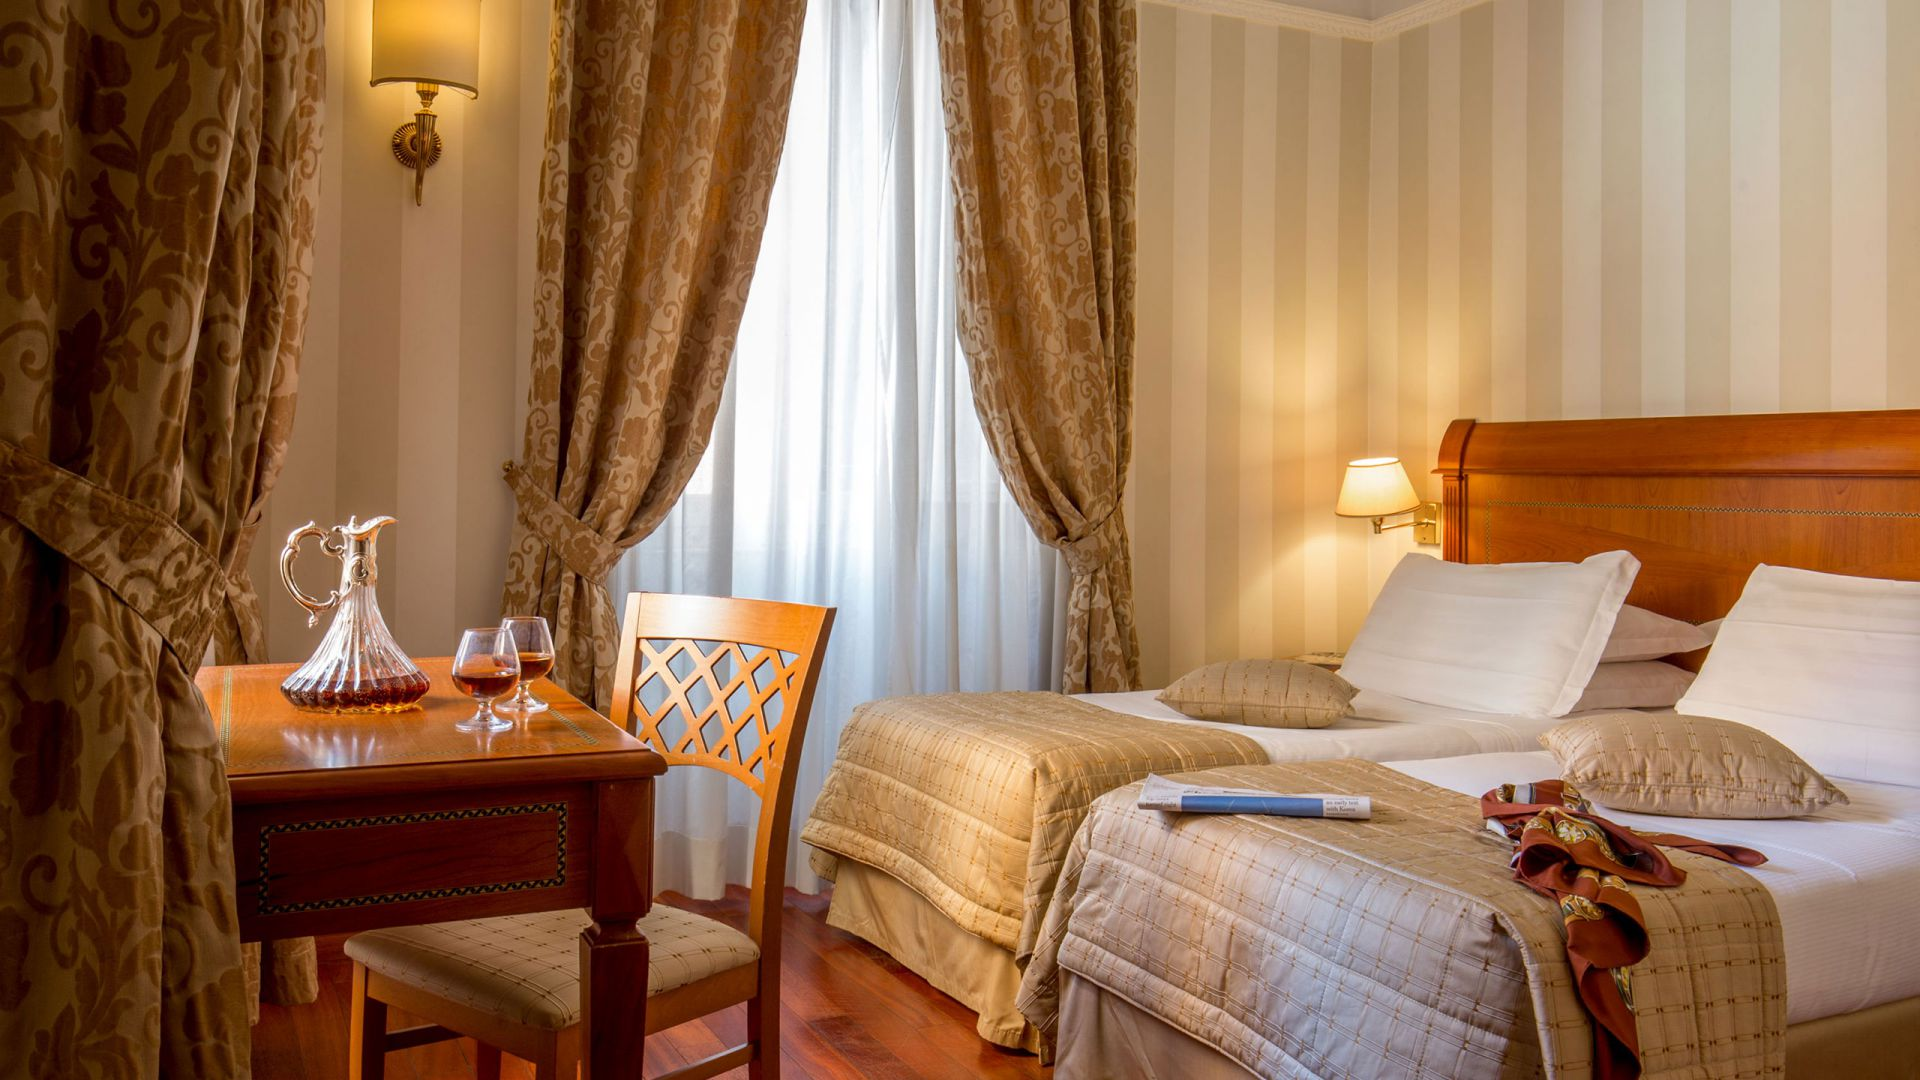 albergo-ottocento-rome-double-room-deluxe-08